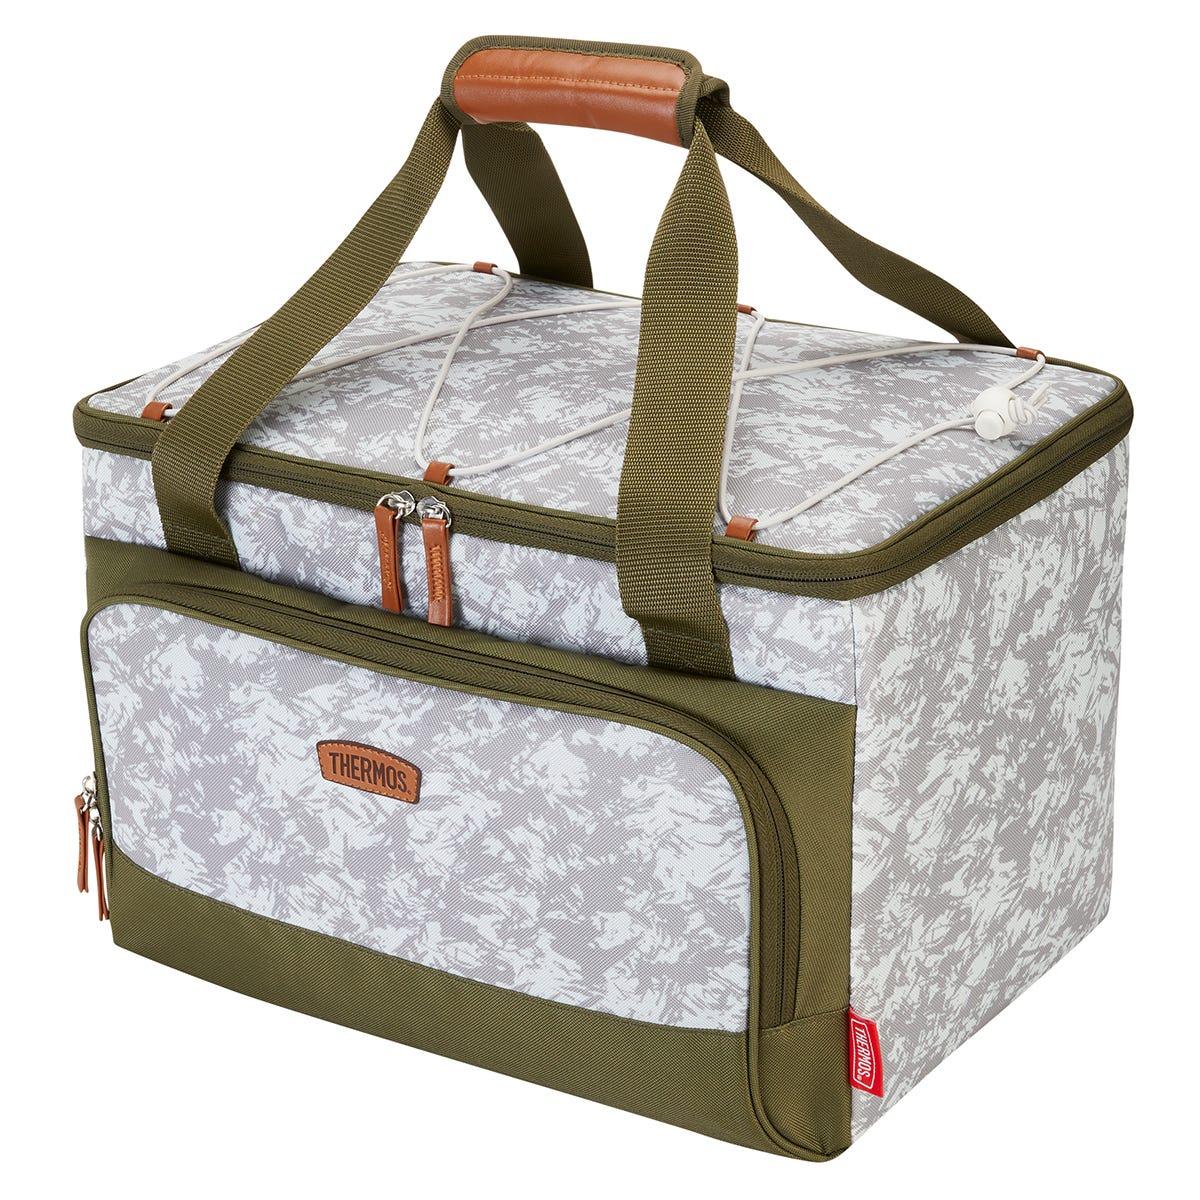 Thermos The Urban Cool Bag 24L - Green/Grey Camo